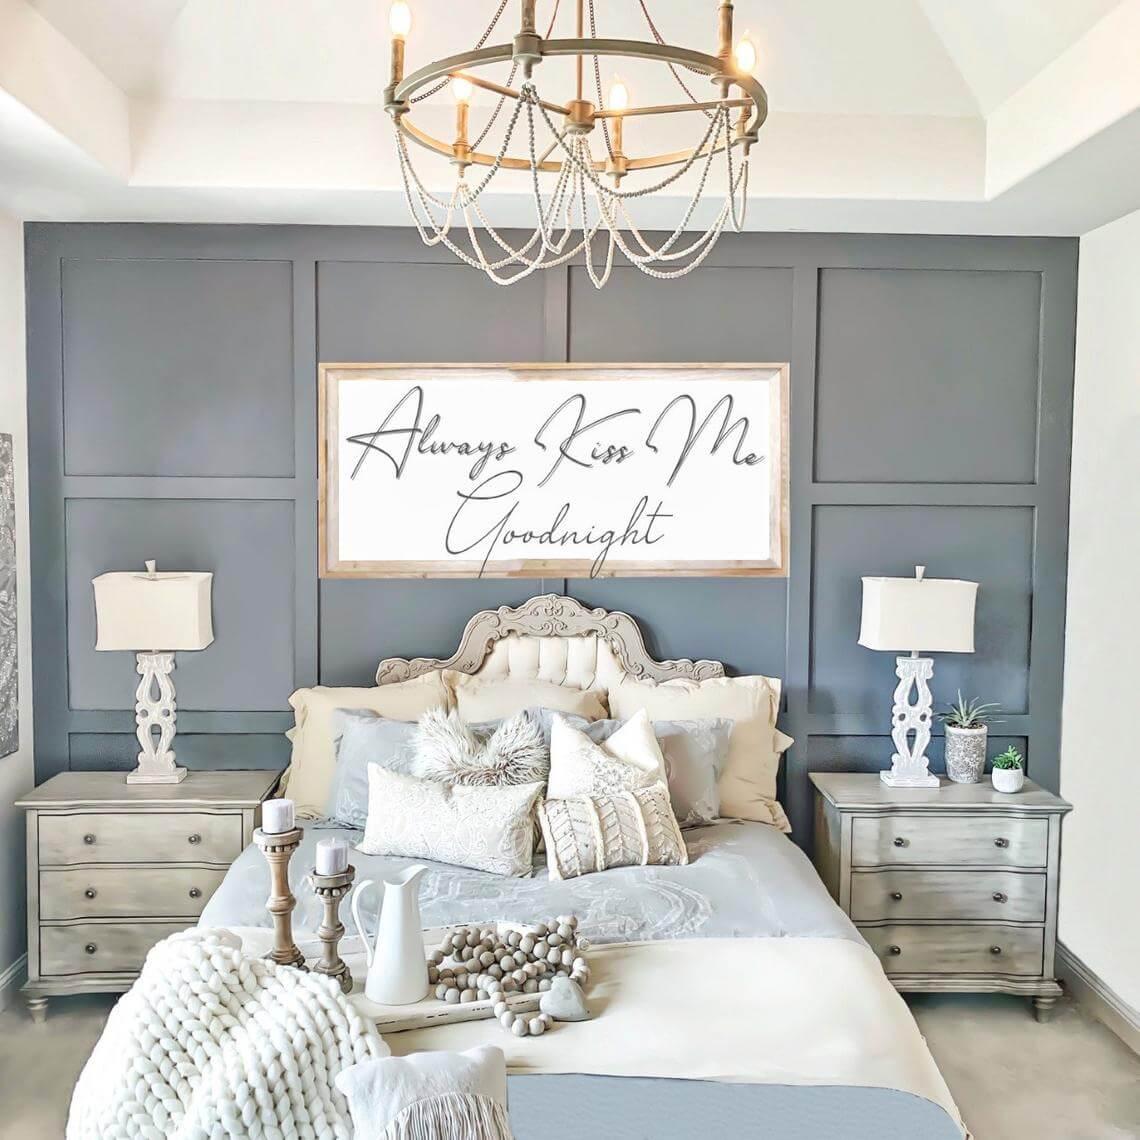 Always Kiss Me Goodnight Charming Modern Bedroom